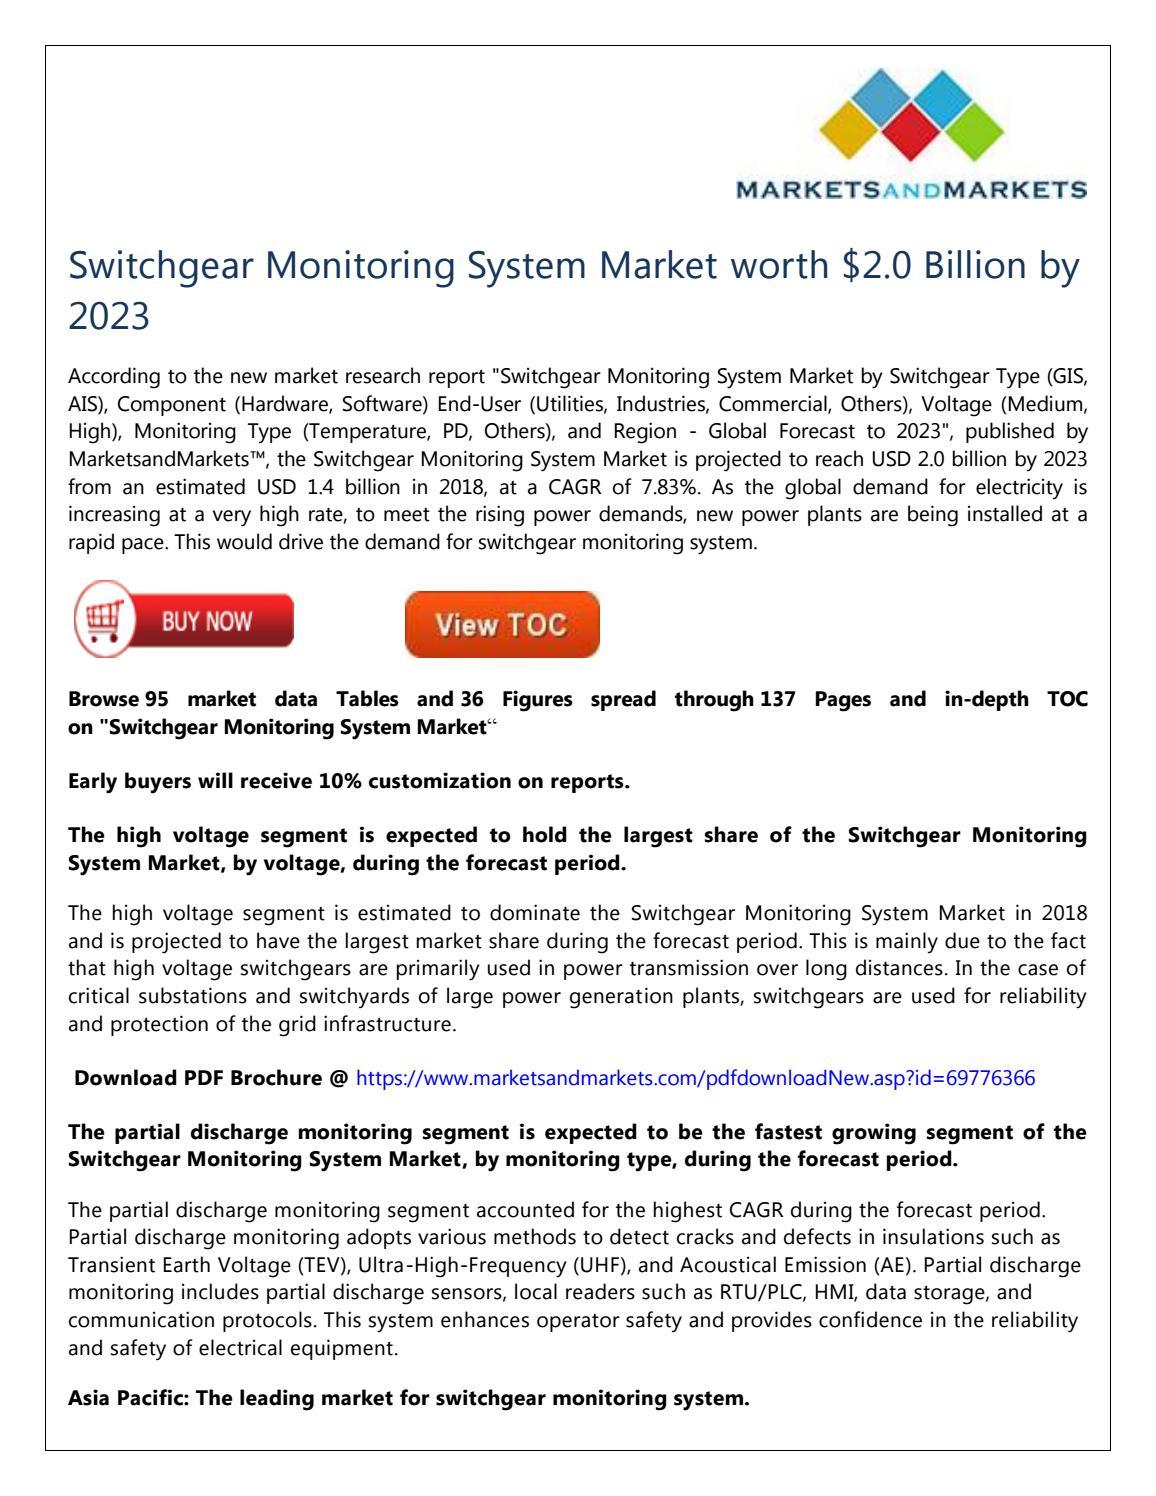 Switchgear Monitoring System Market worth $2 0 Billion by 2023 by